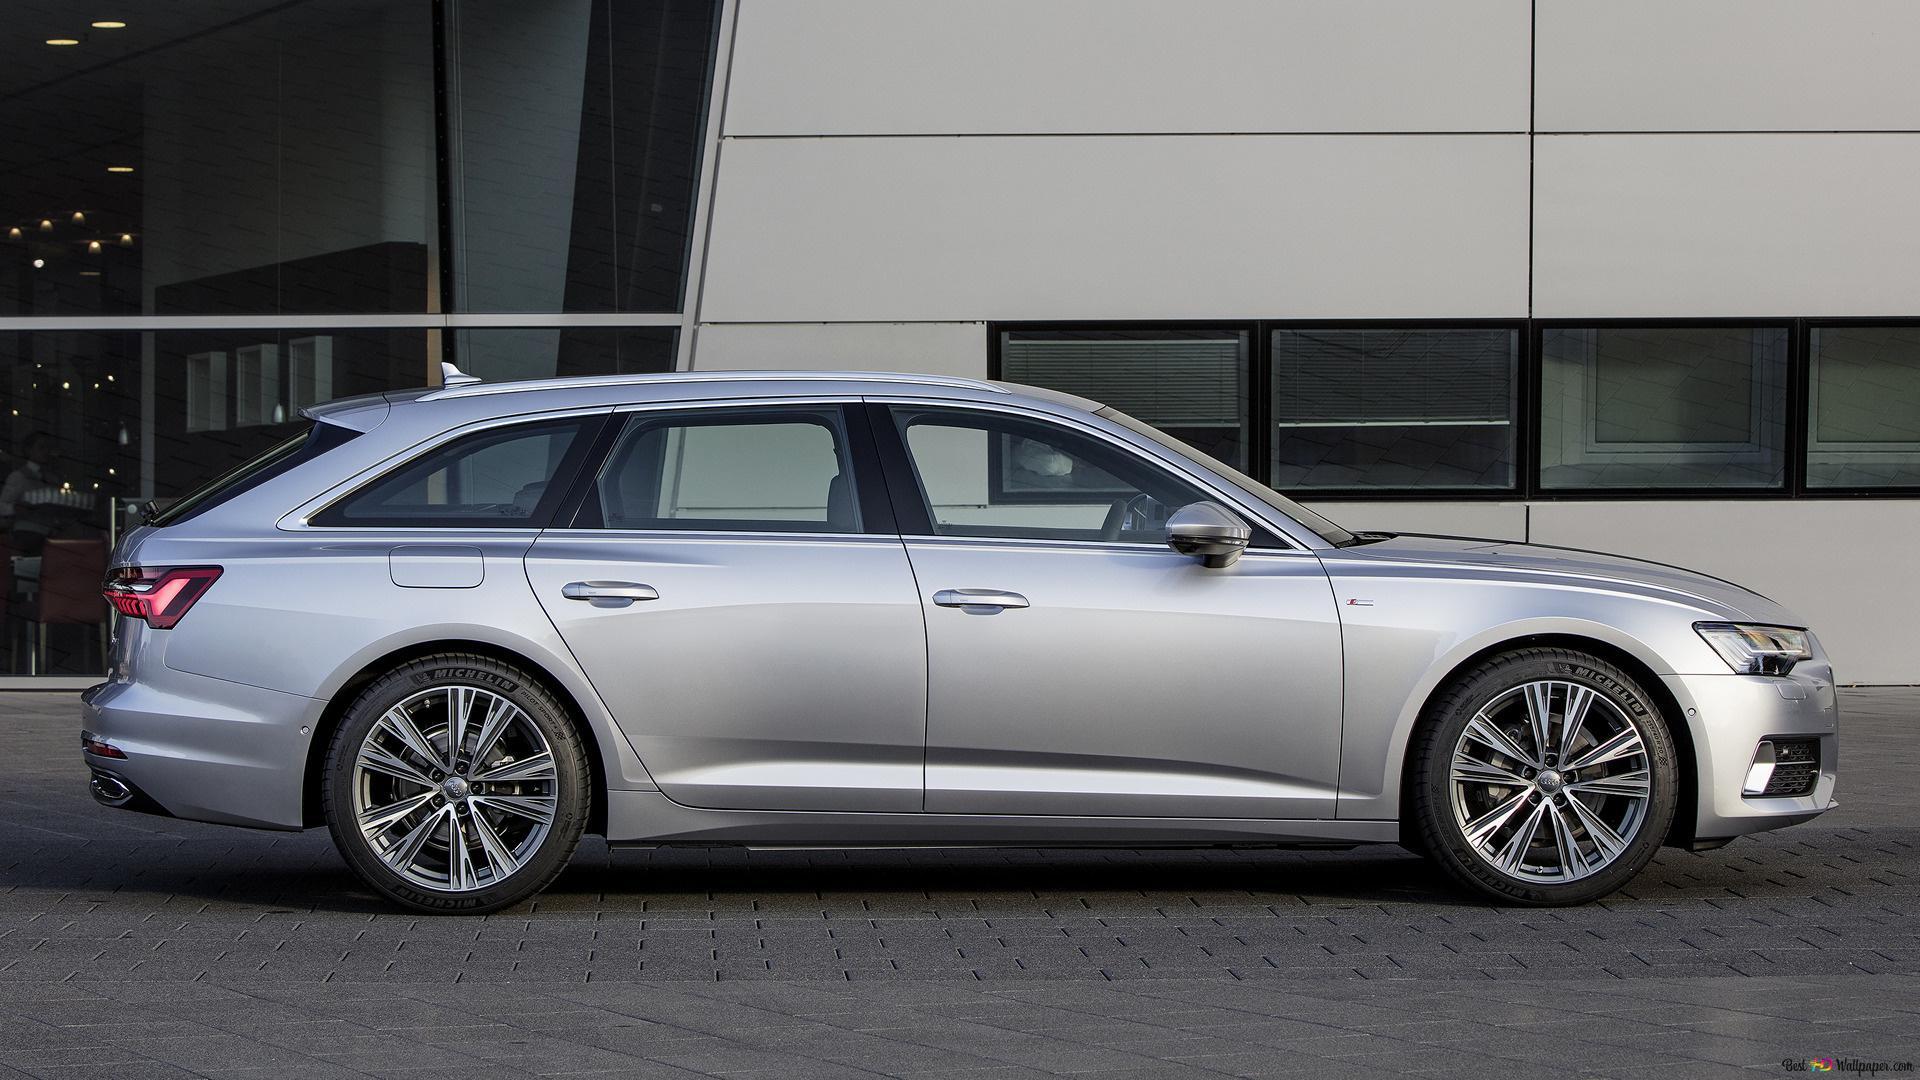 Audi A6 Avant 2018 03 Unduhan Wallpaper Hd